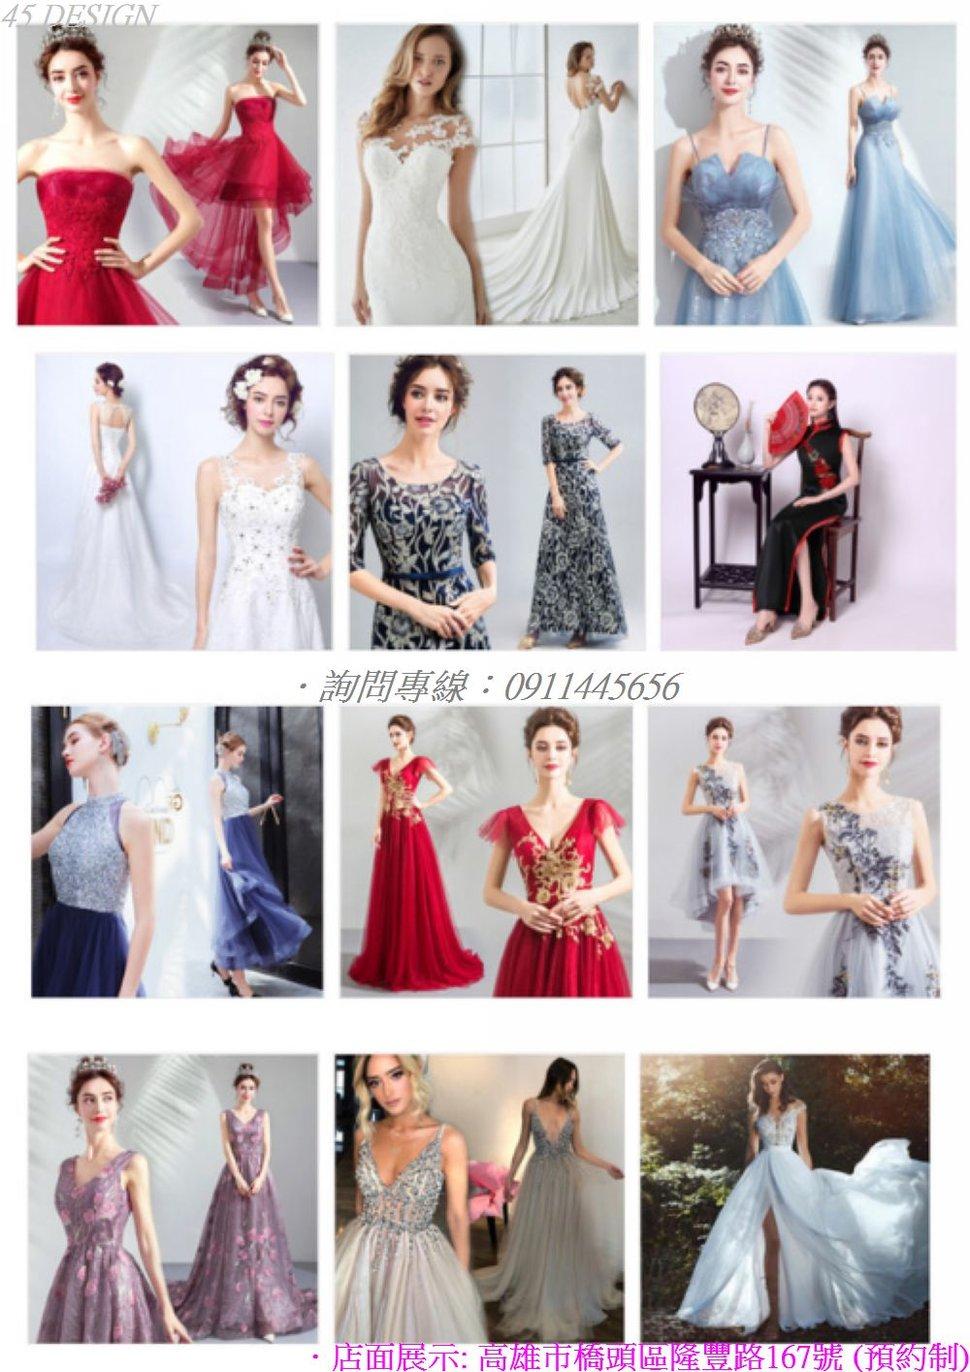 msl190815C9DEB86164454AAAAED007876277B738 - 全台最便宜-45DESIGN四五婚紗禮服《結婚吧》